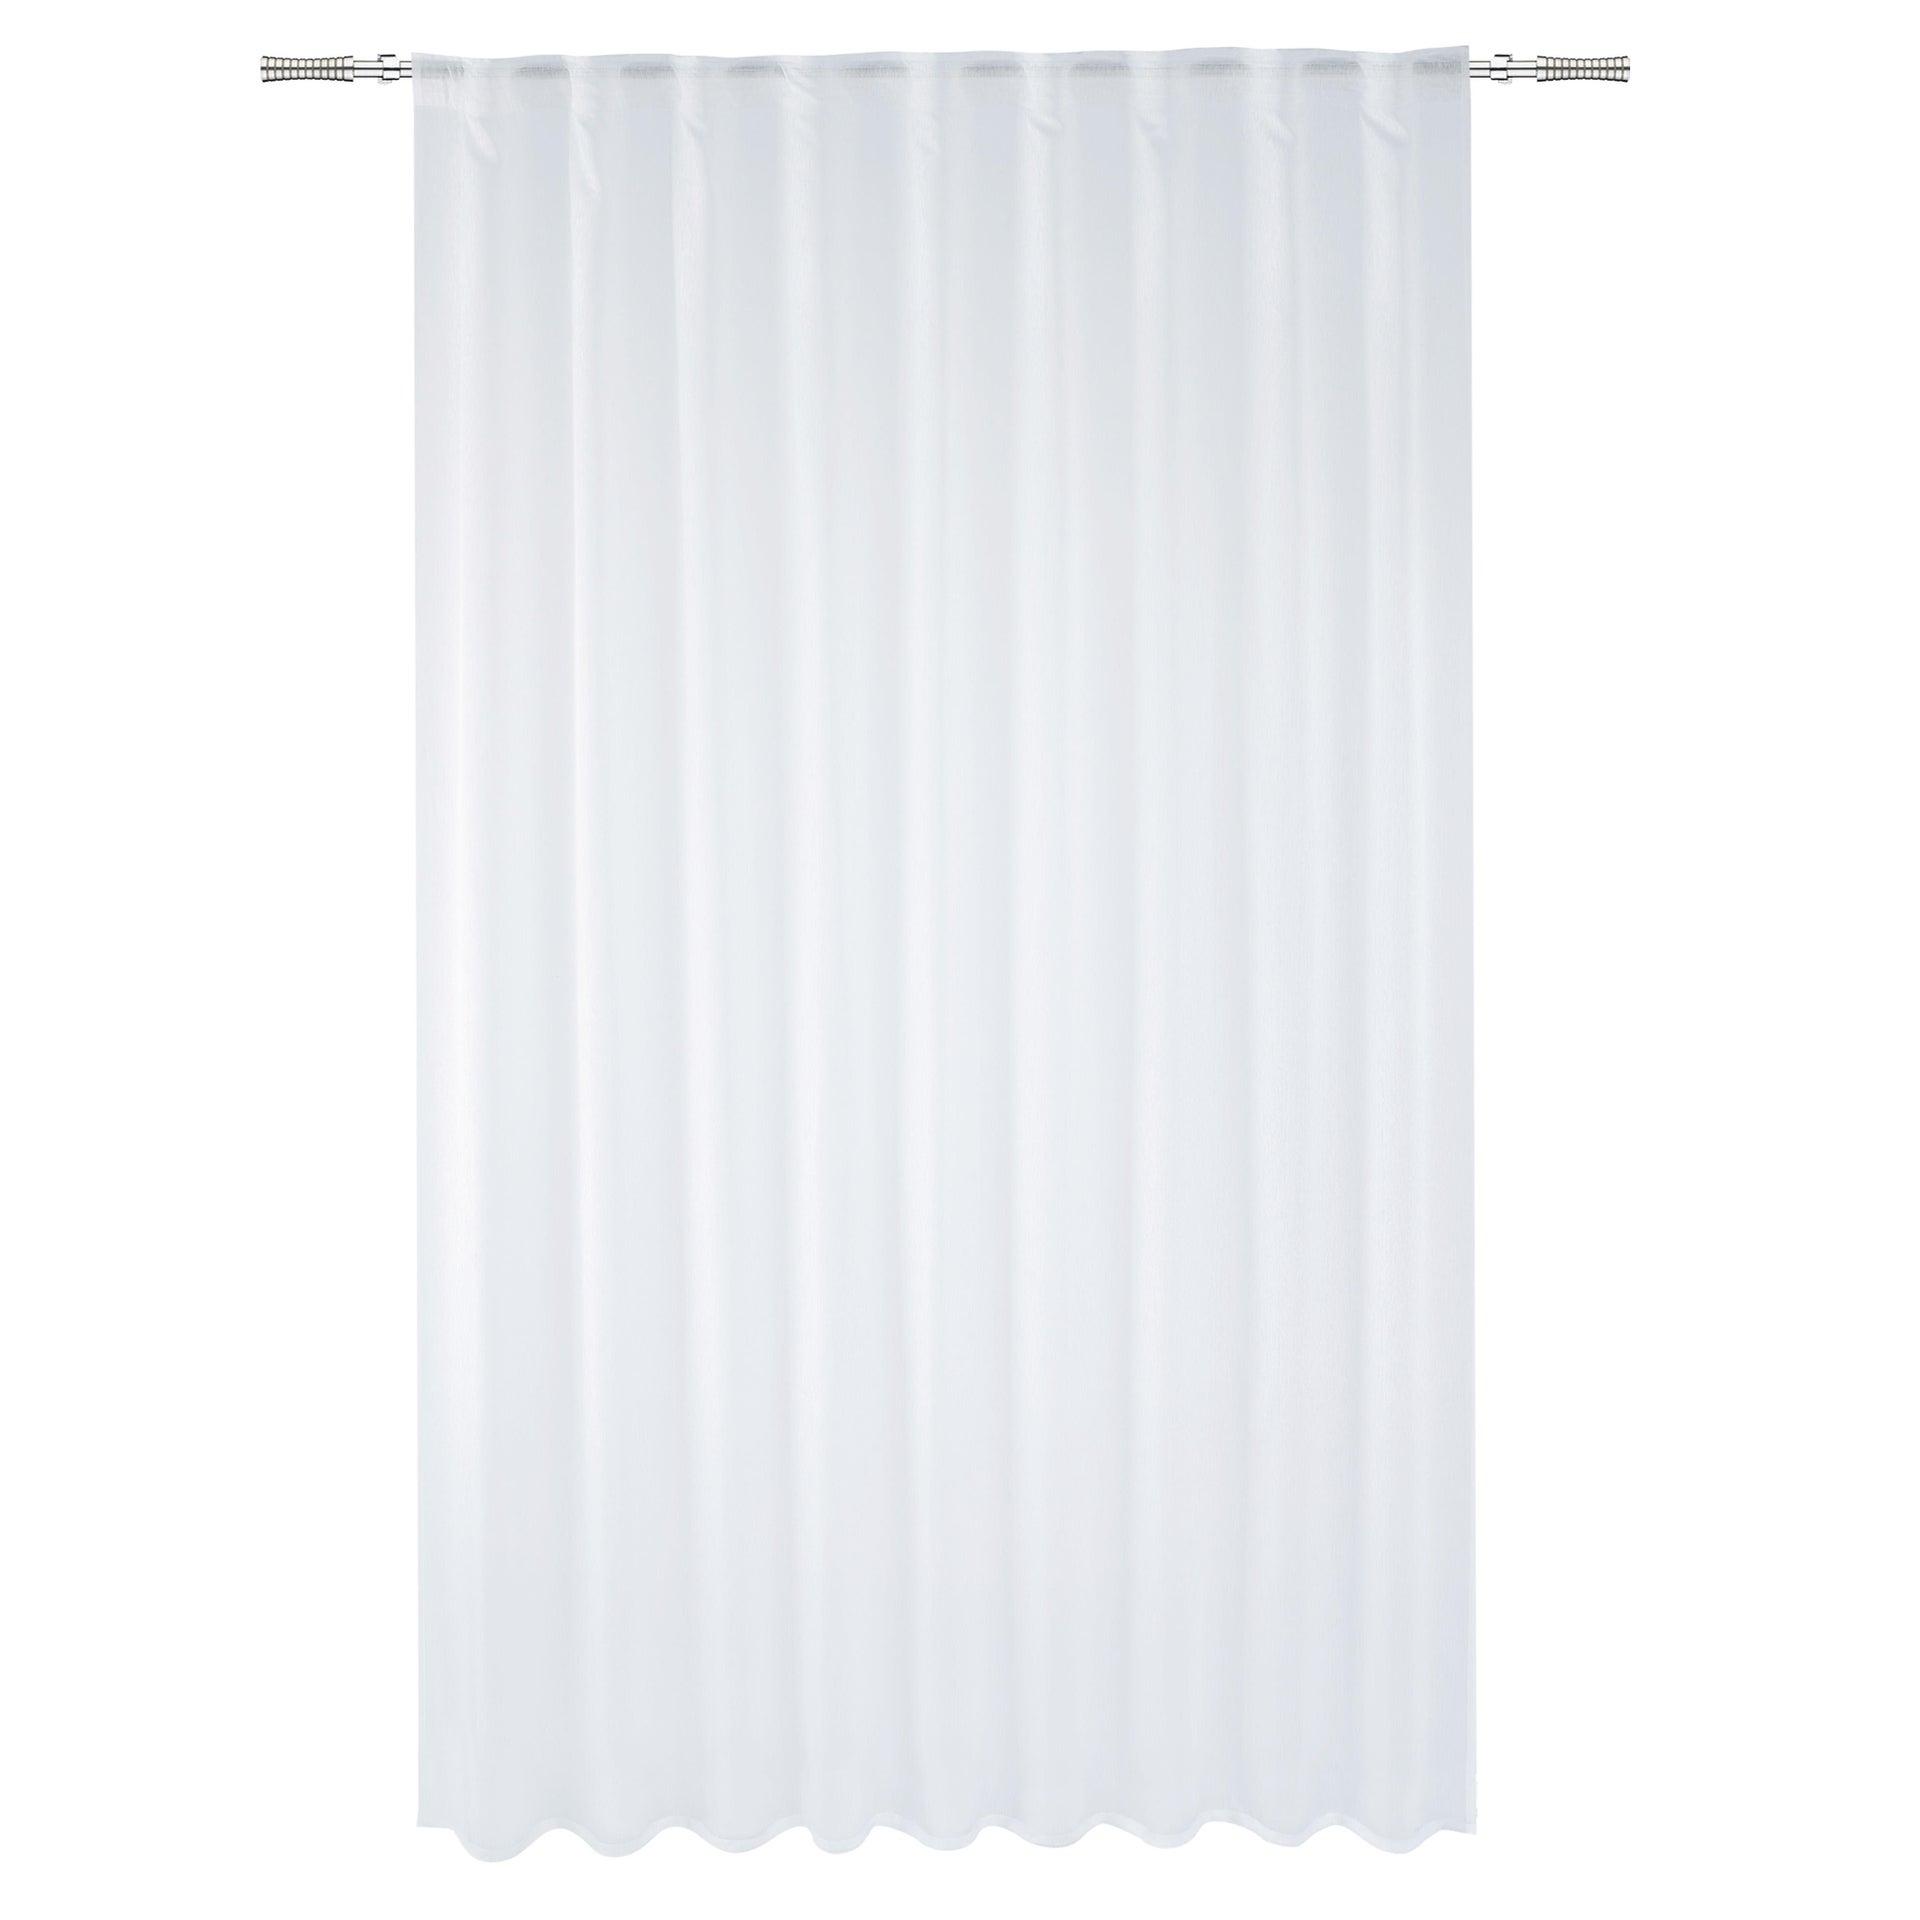 Tenda INSPIRE Softy bianco fettuccia e passanti 200 x 280 cm - 5